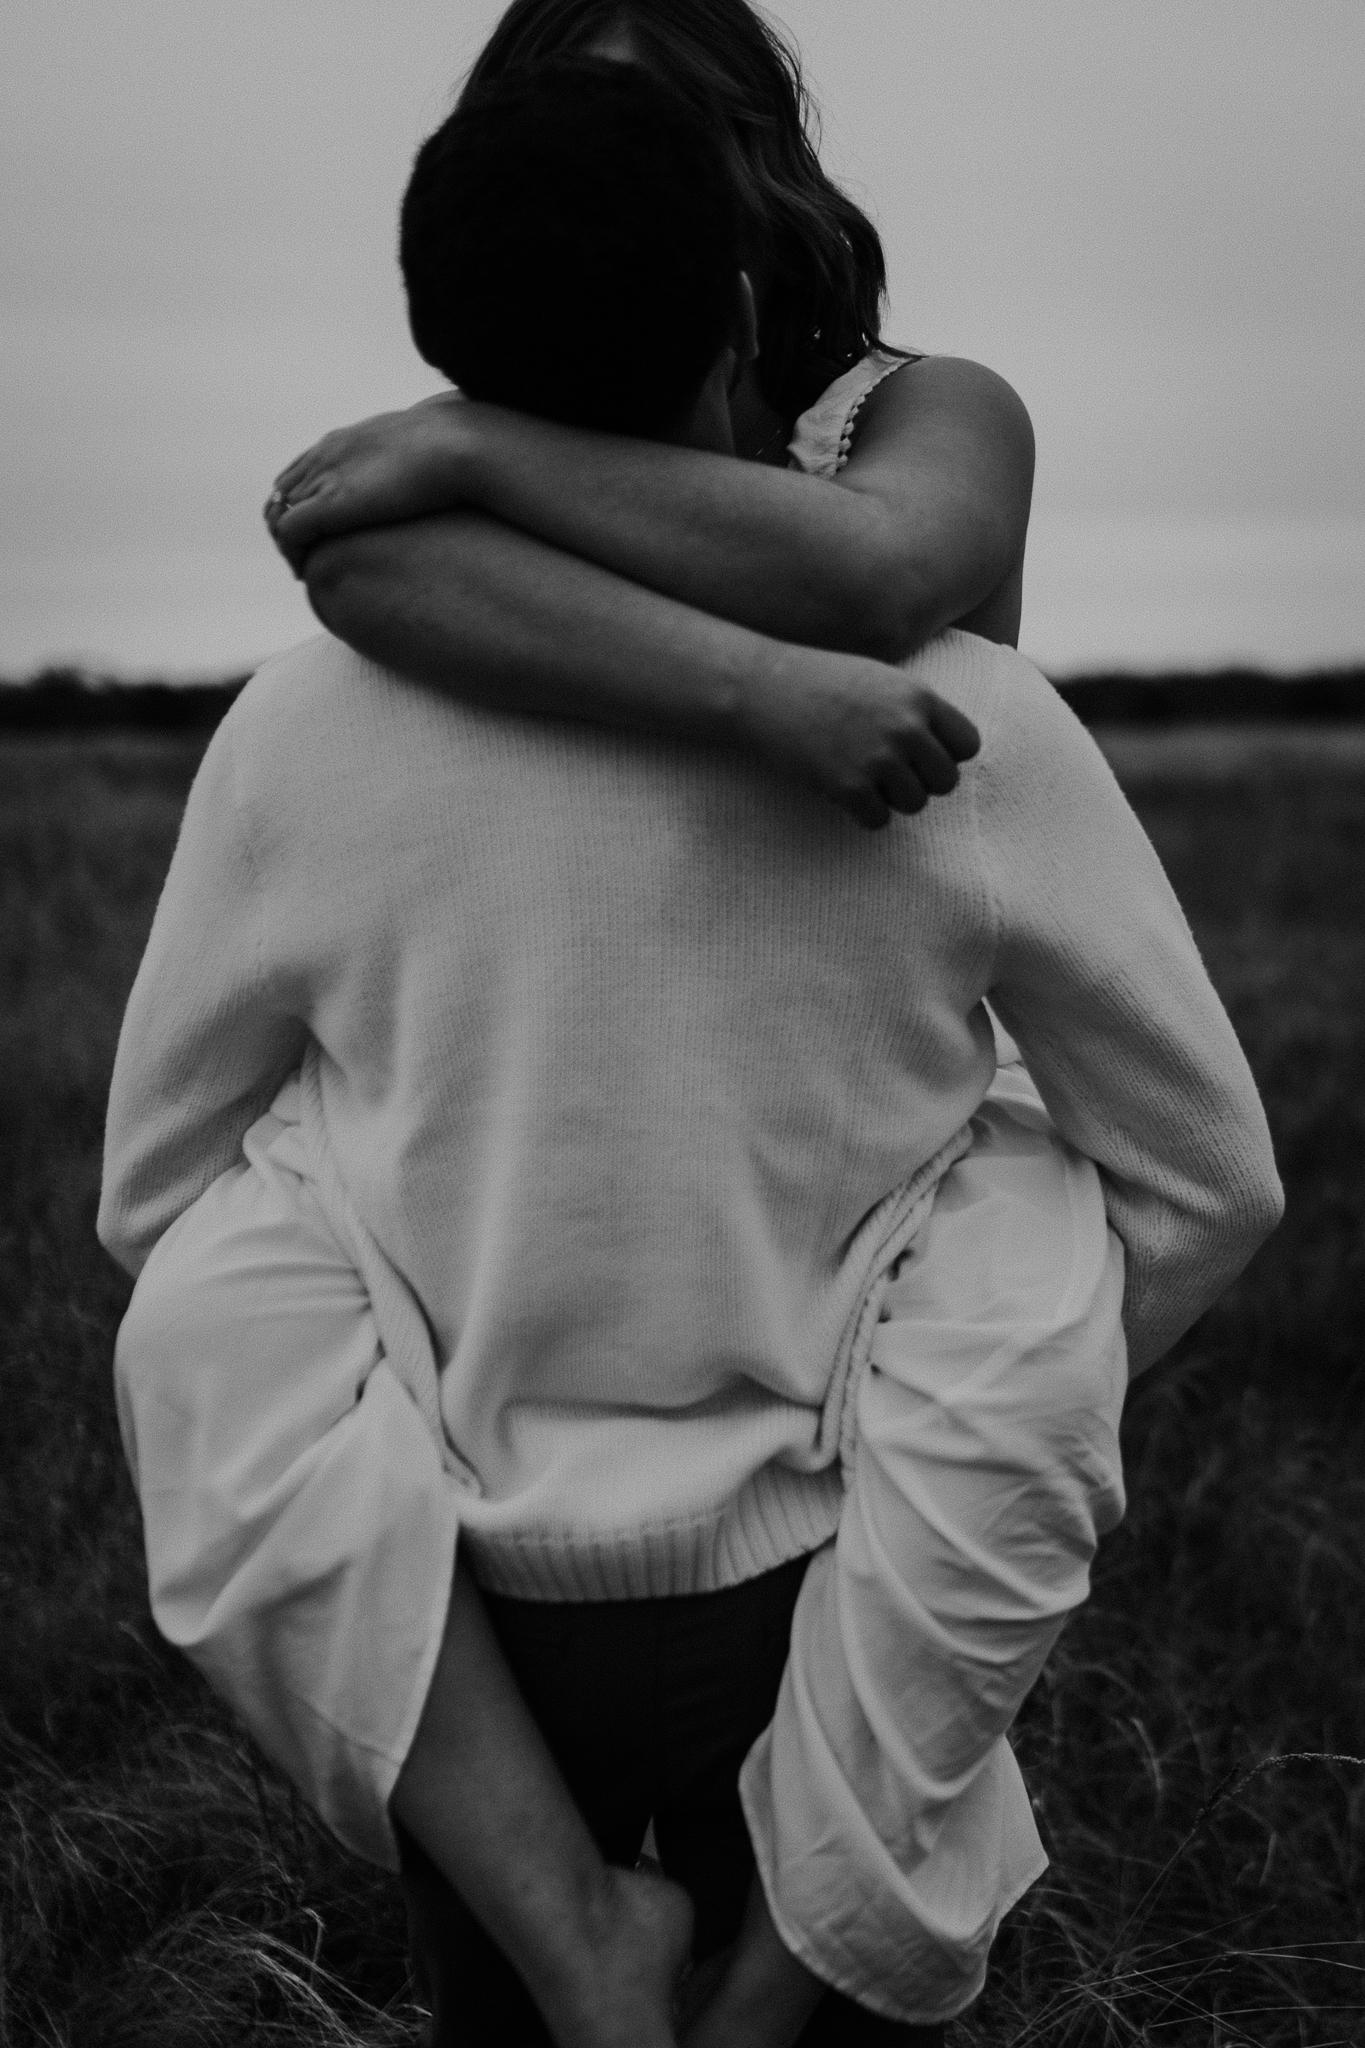 Fort-Worth-Photographer-Engagement-Photographer-Laken-Mackenzie-Photography (15 of 15).jpg